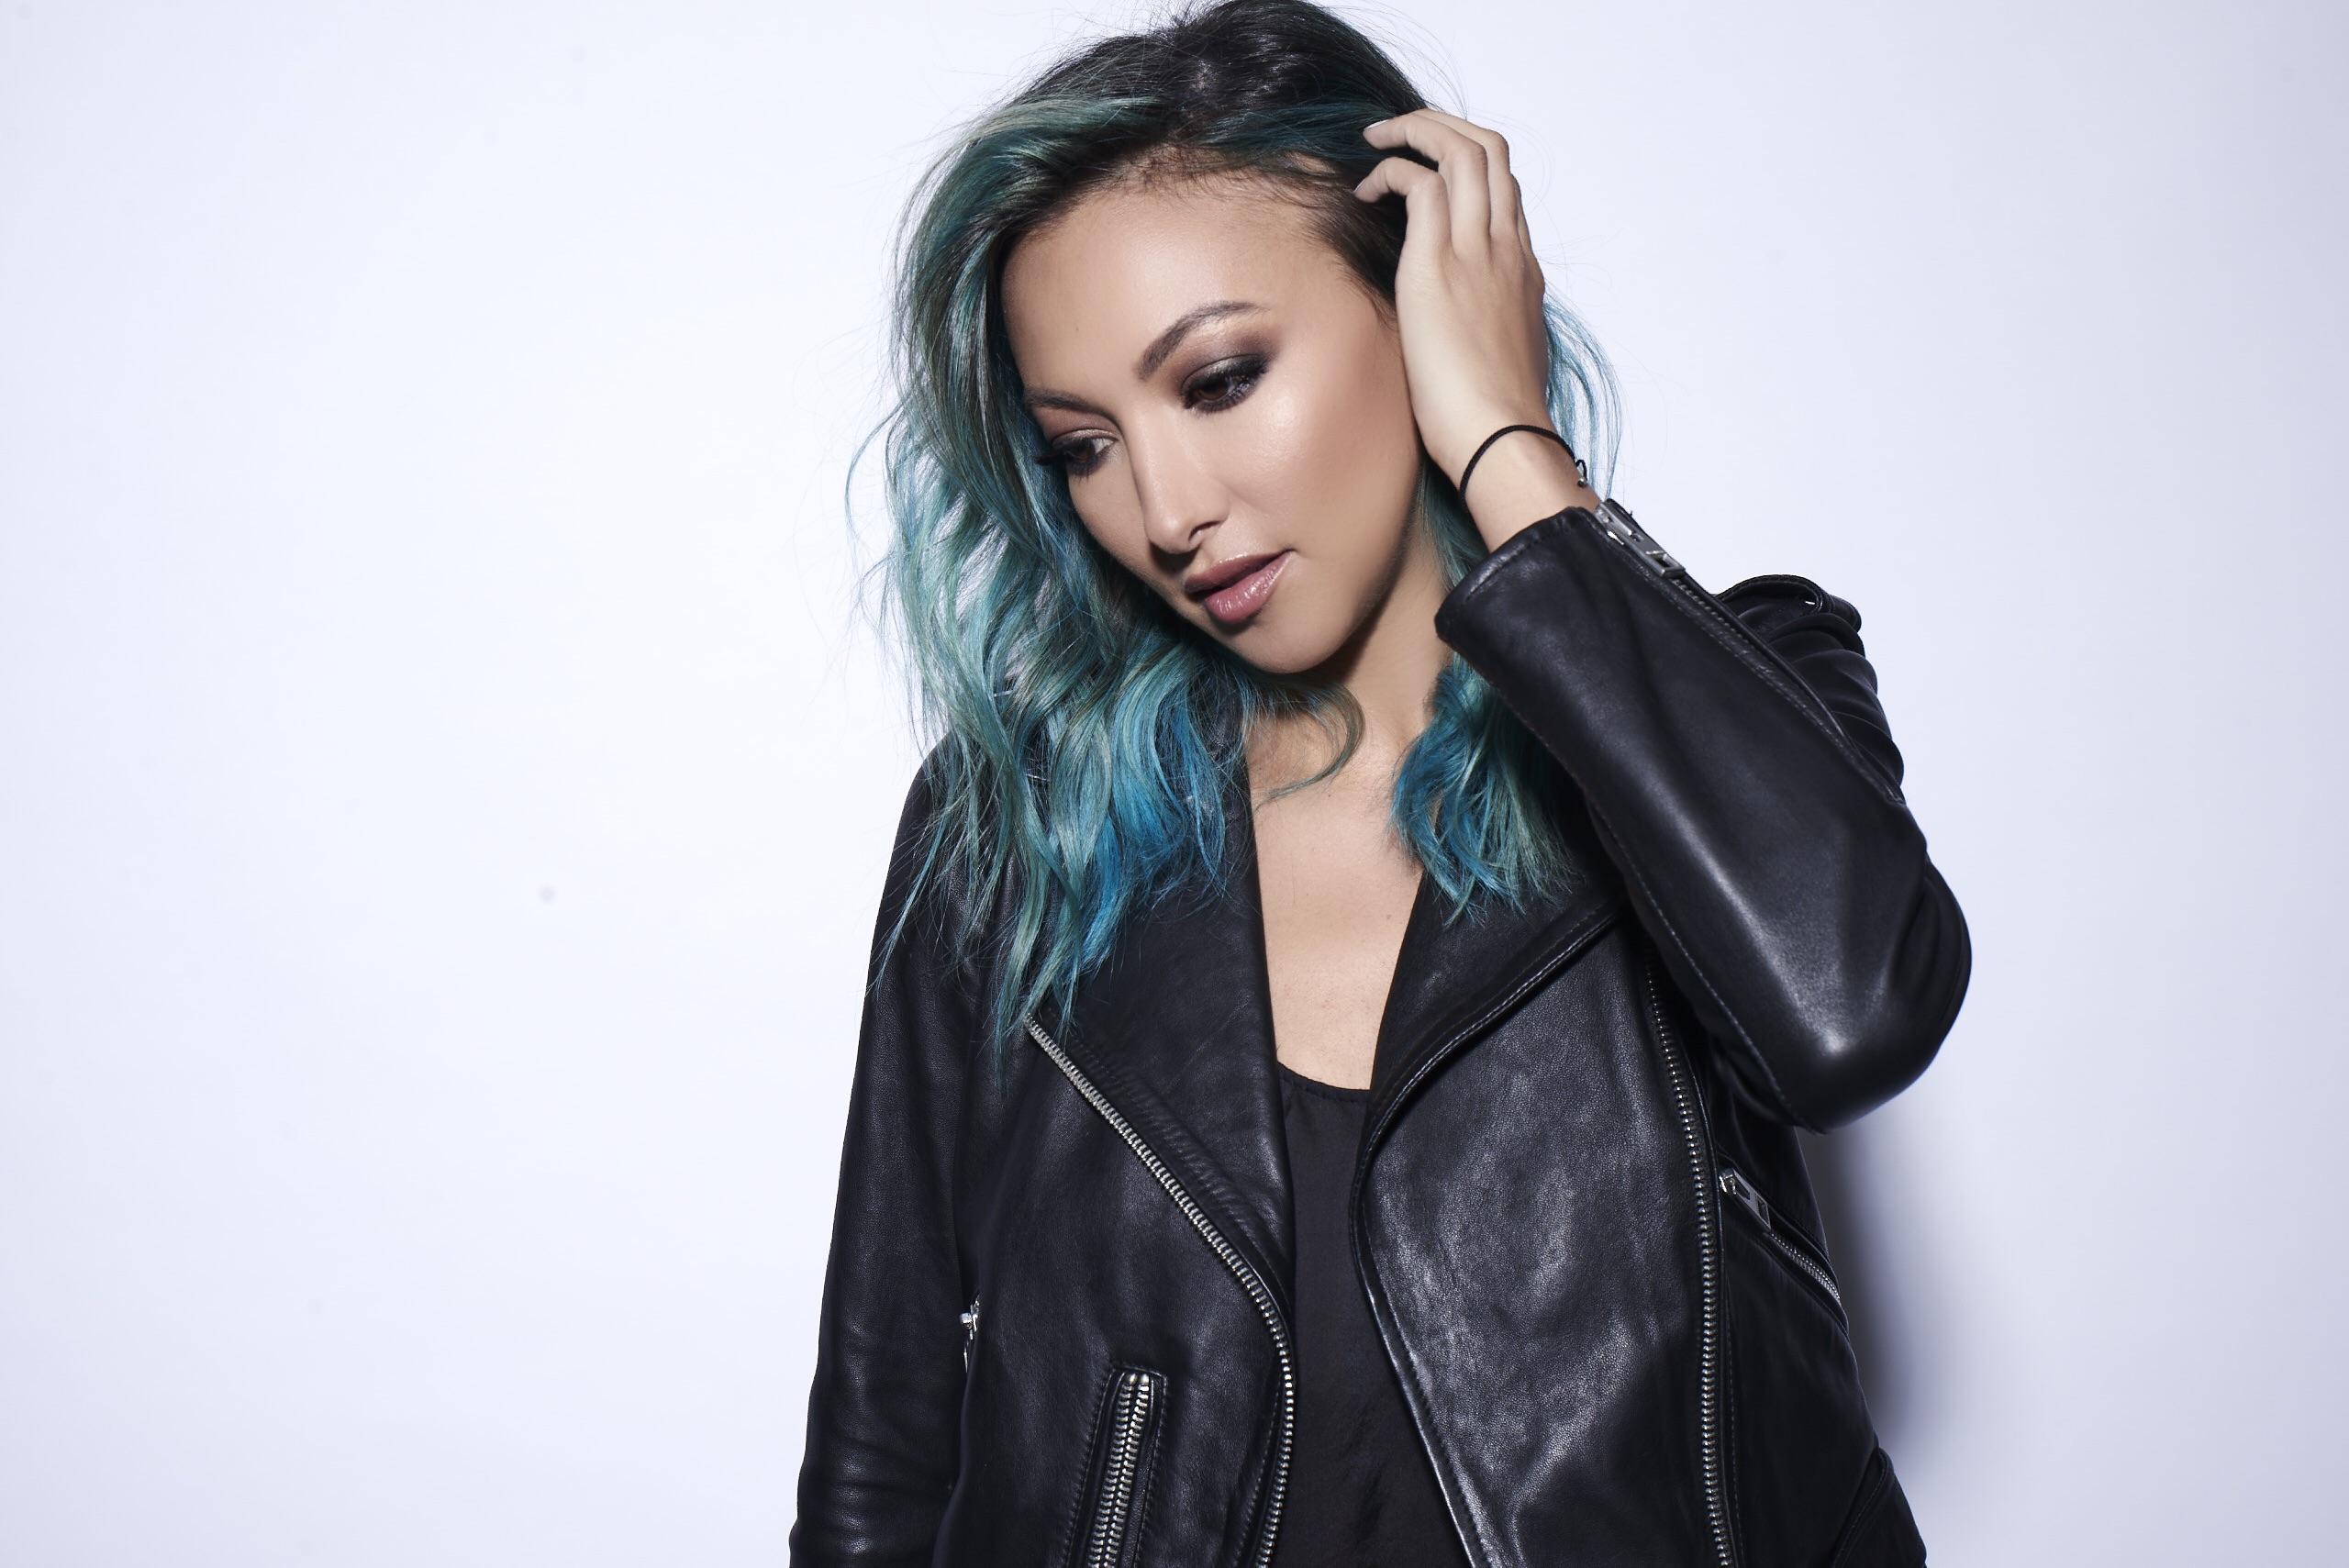 Lauren Lane Stuns With Pete Tong Showcase Mix